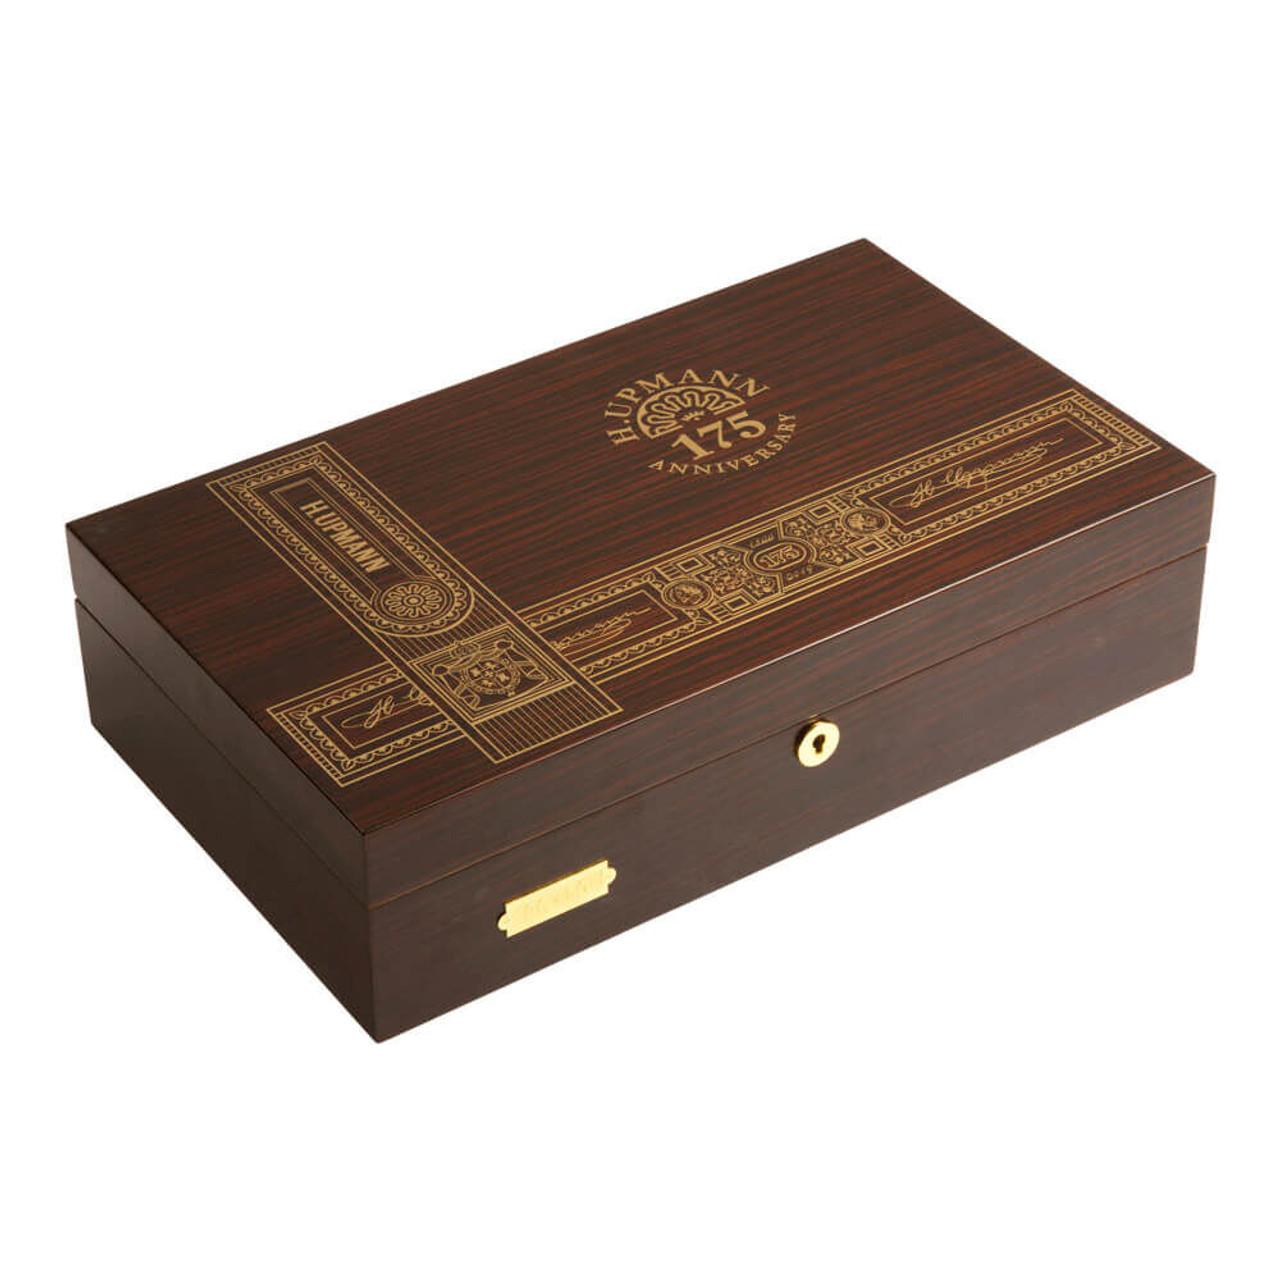 H. Upmann 175 Anniversary Churchill Cigars - 7 x 50 (Box of 50)